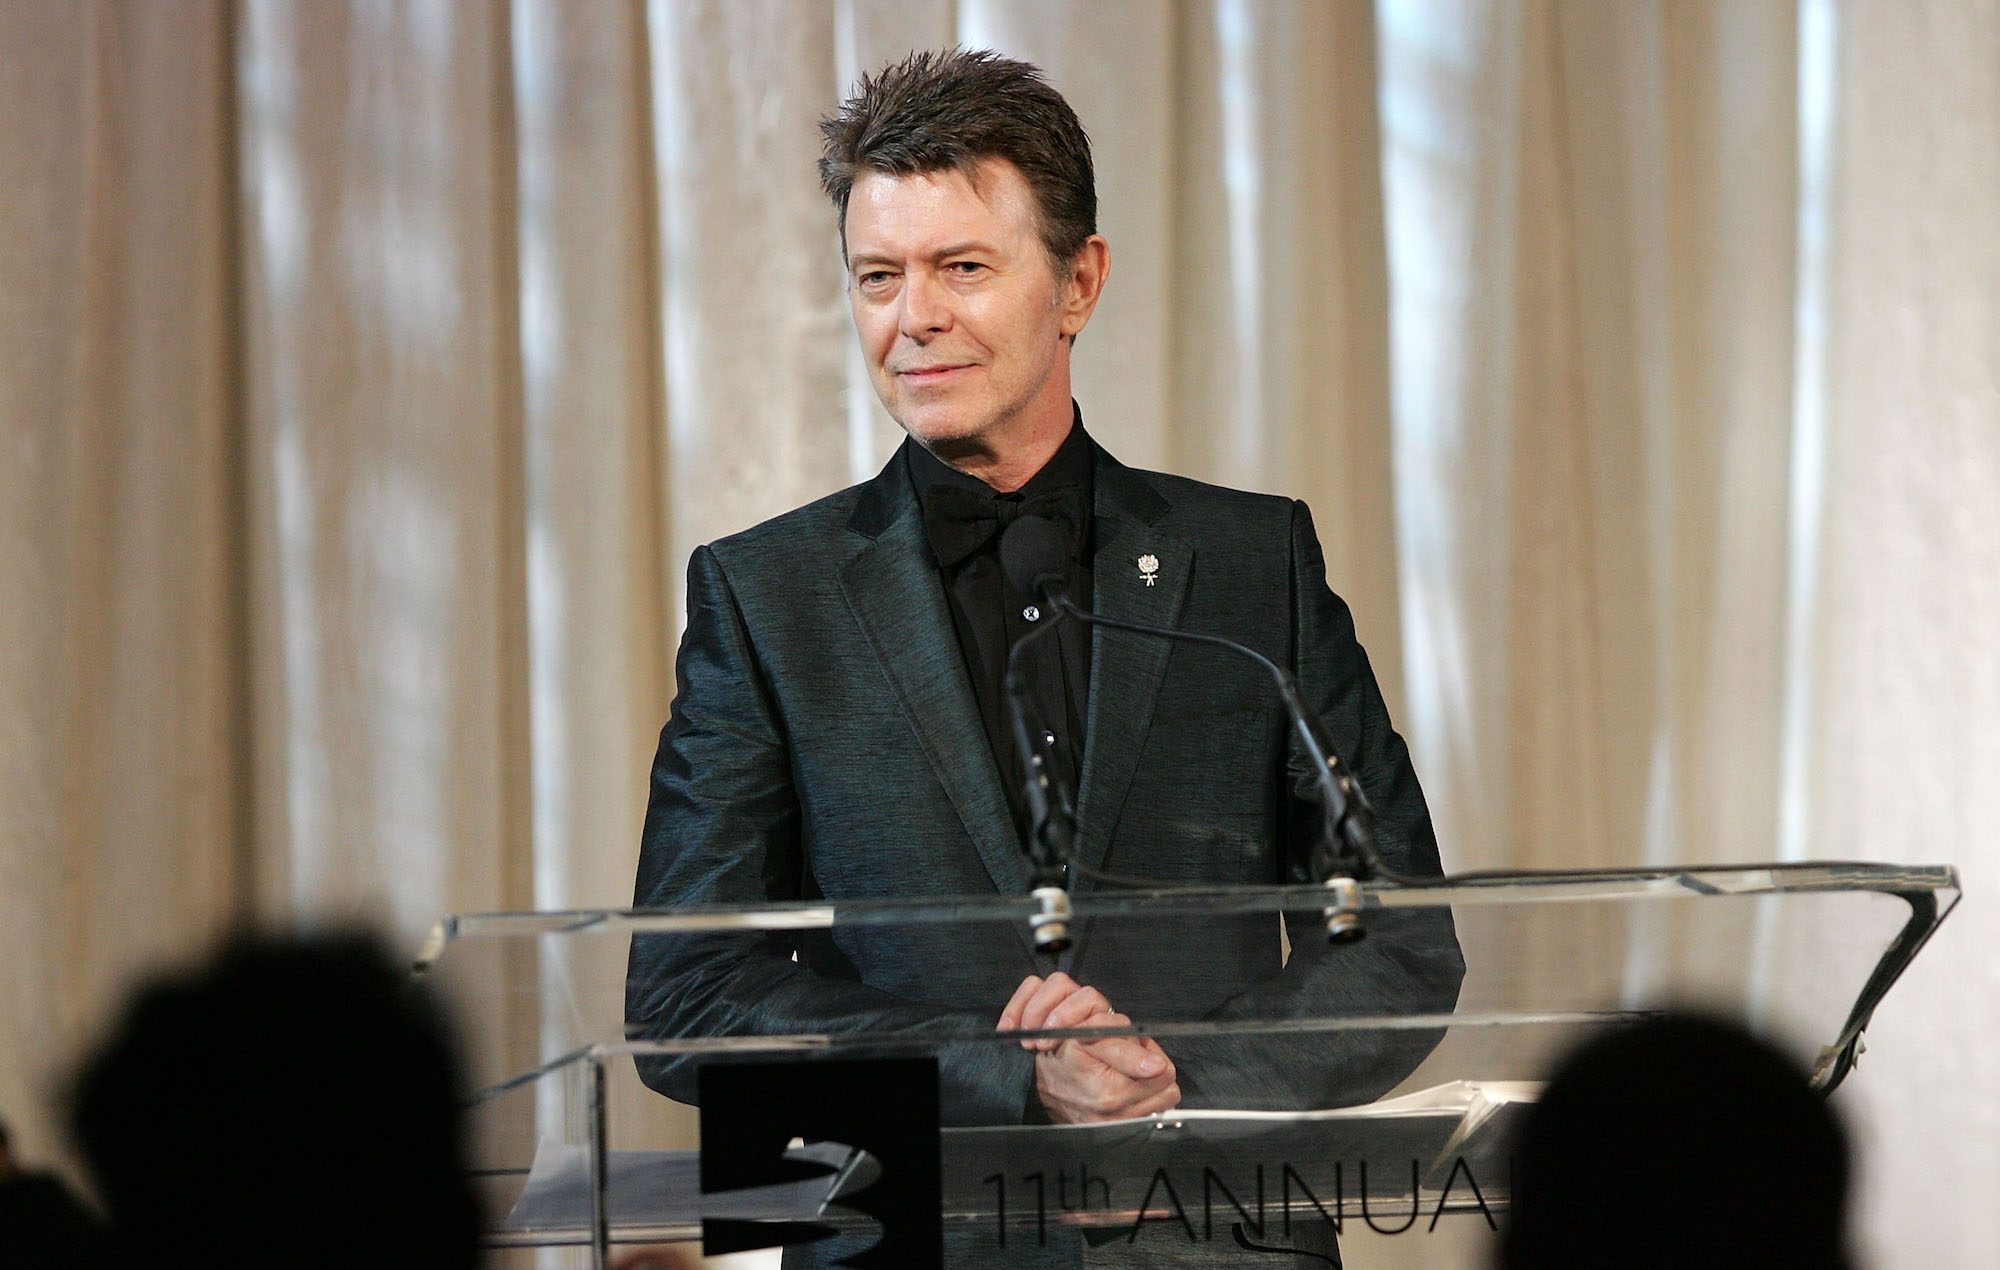 First-known David Bowie